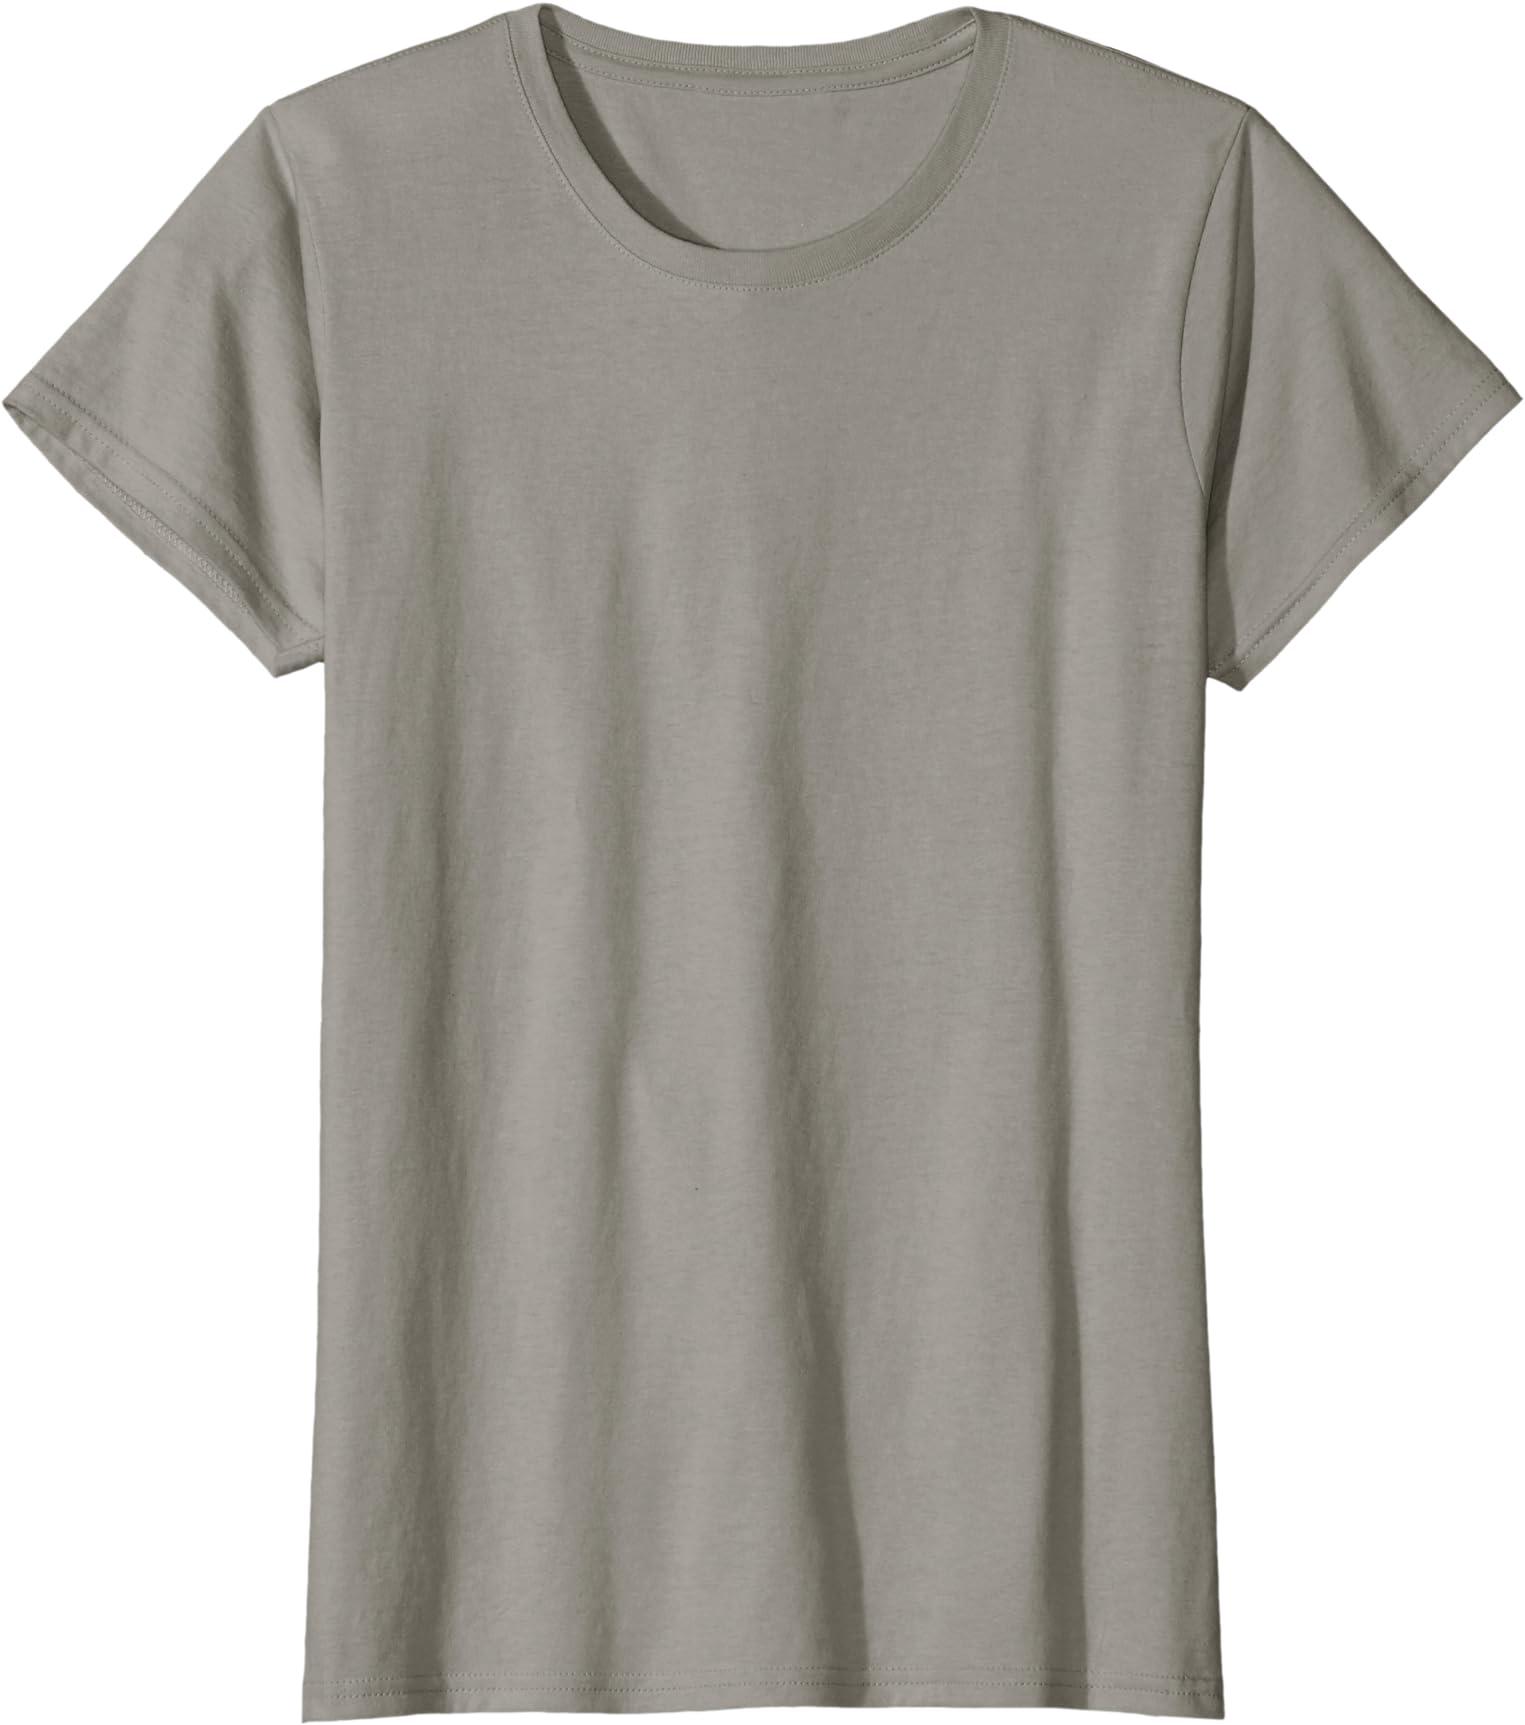 I Shih Tzu Not Heather Grey Adult T-Shirt